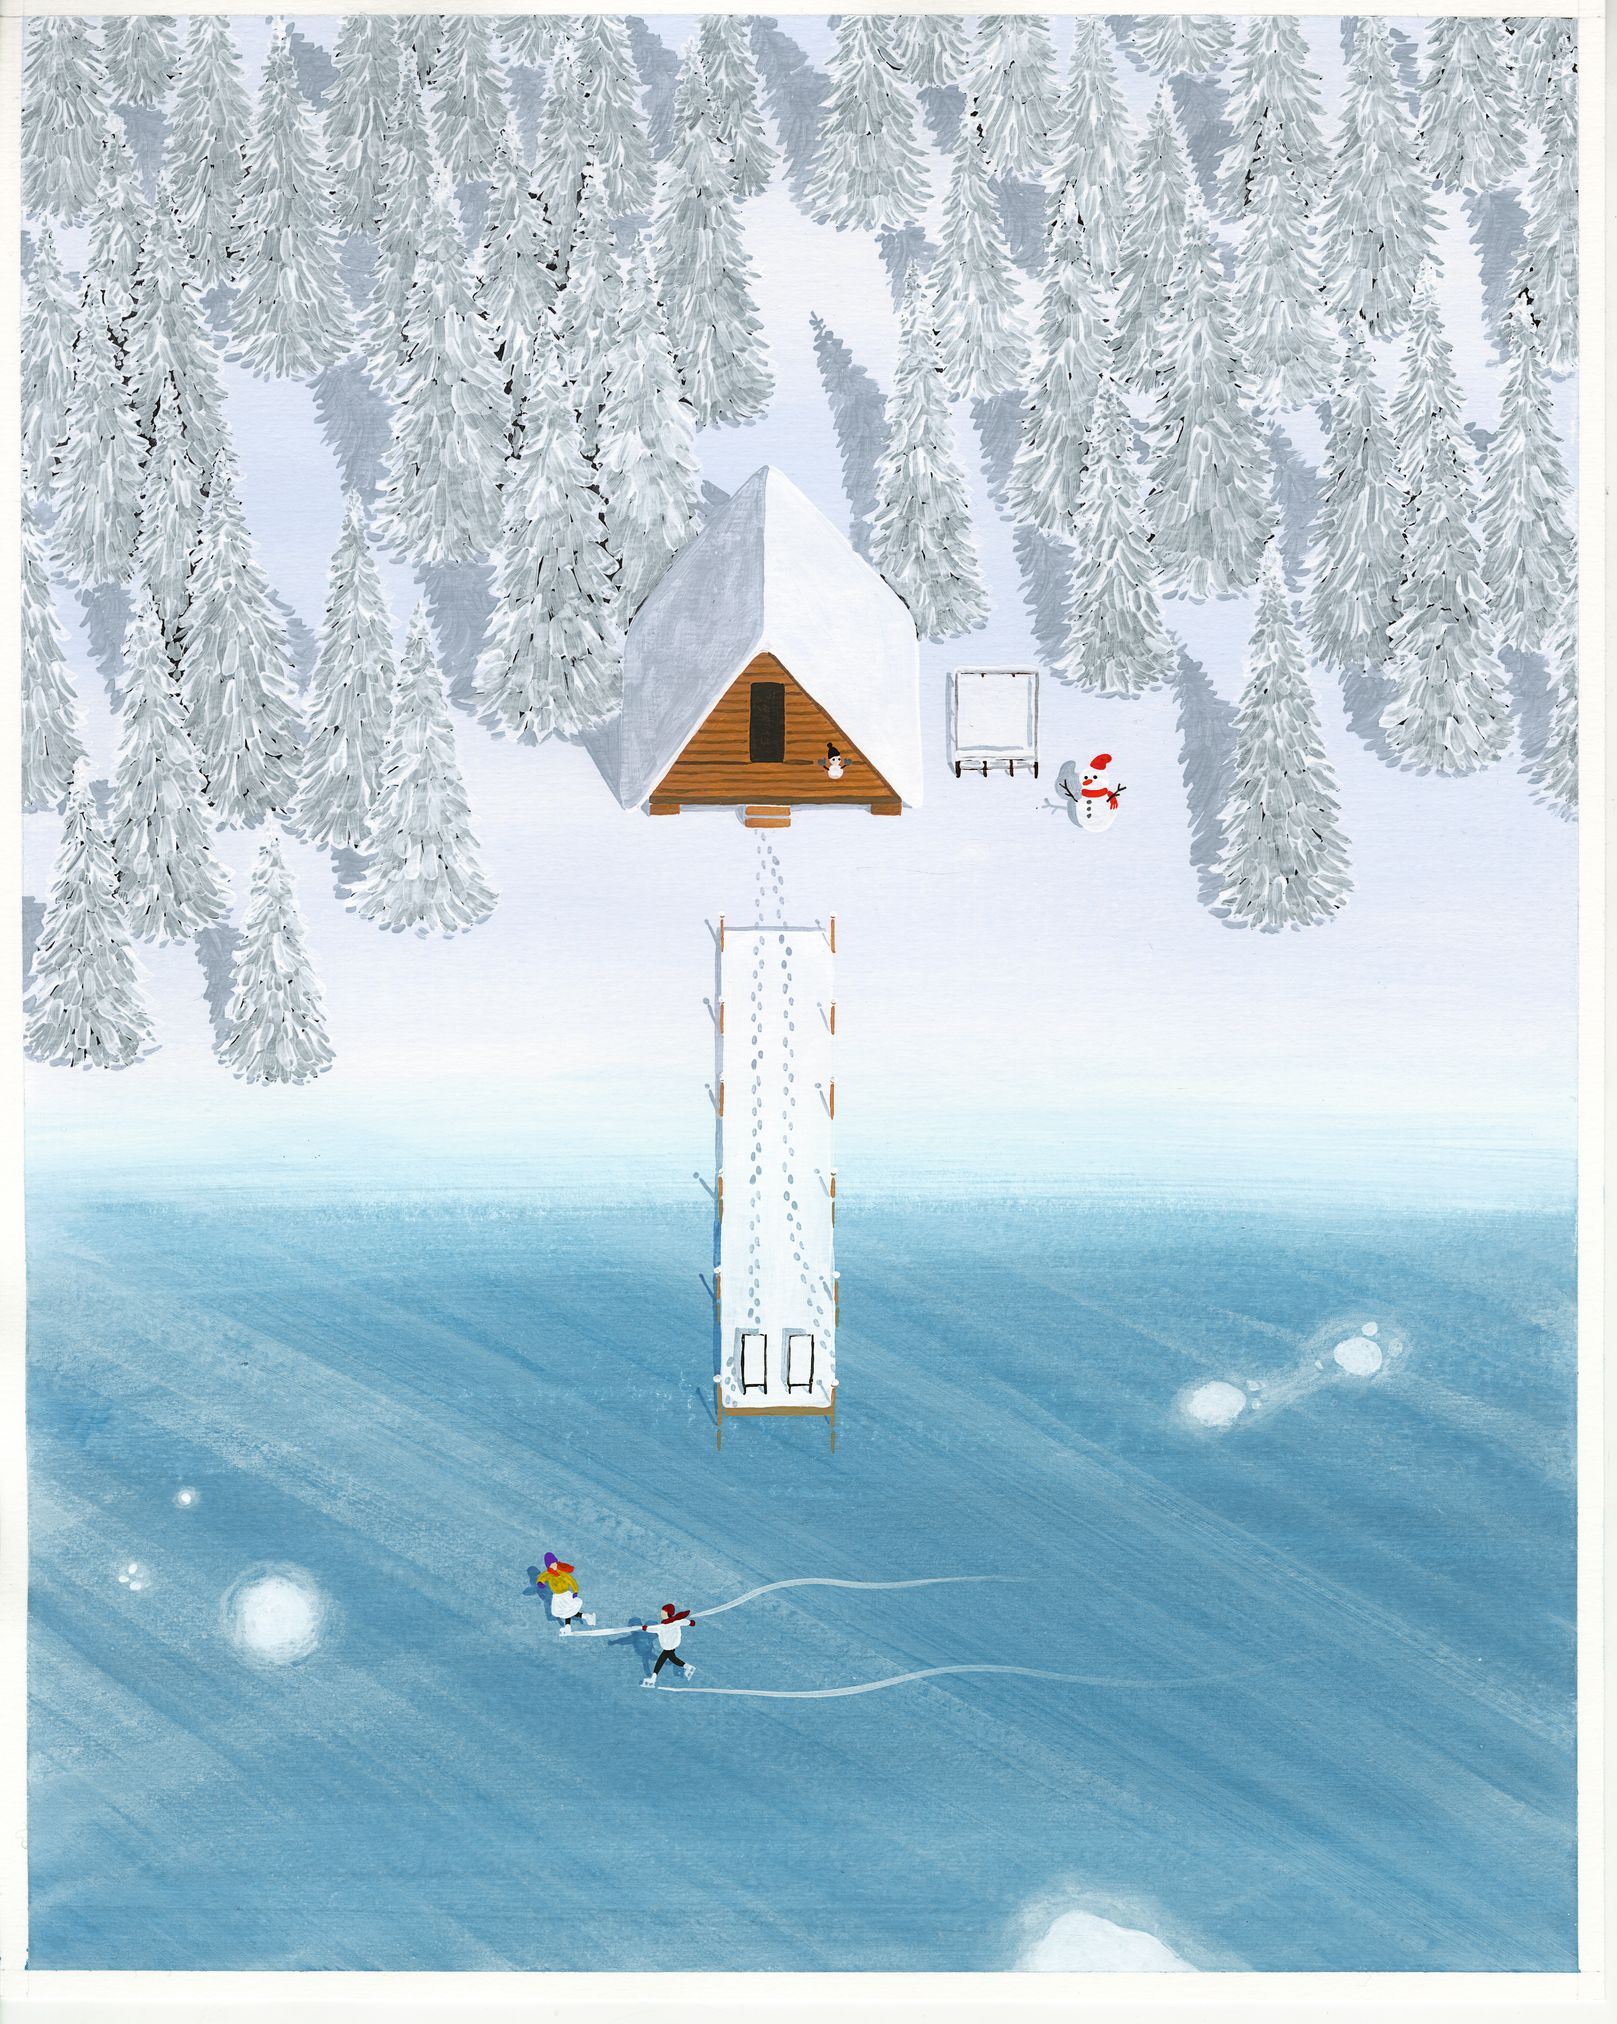 garance-illustration-yukiko-noritake-The-Brothers-Forest9